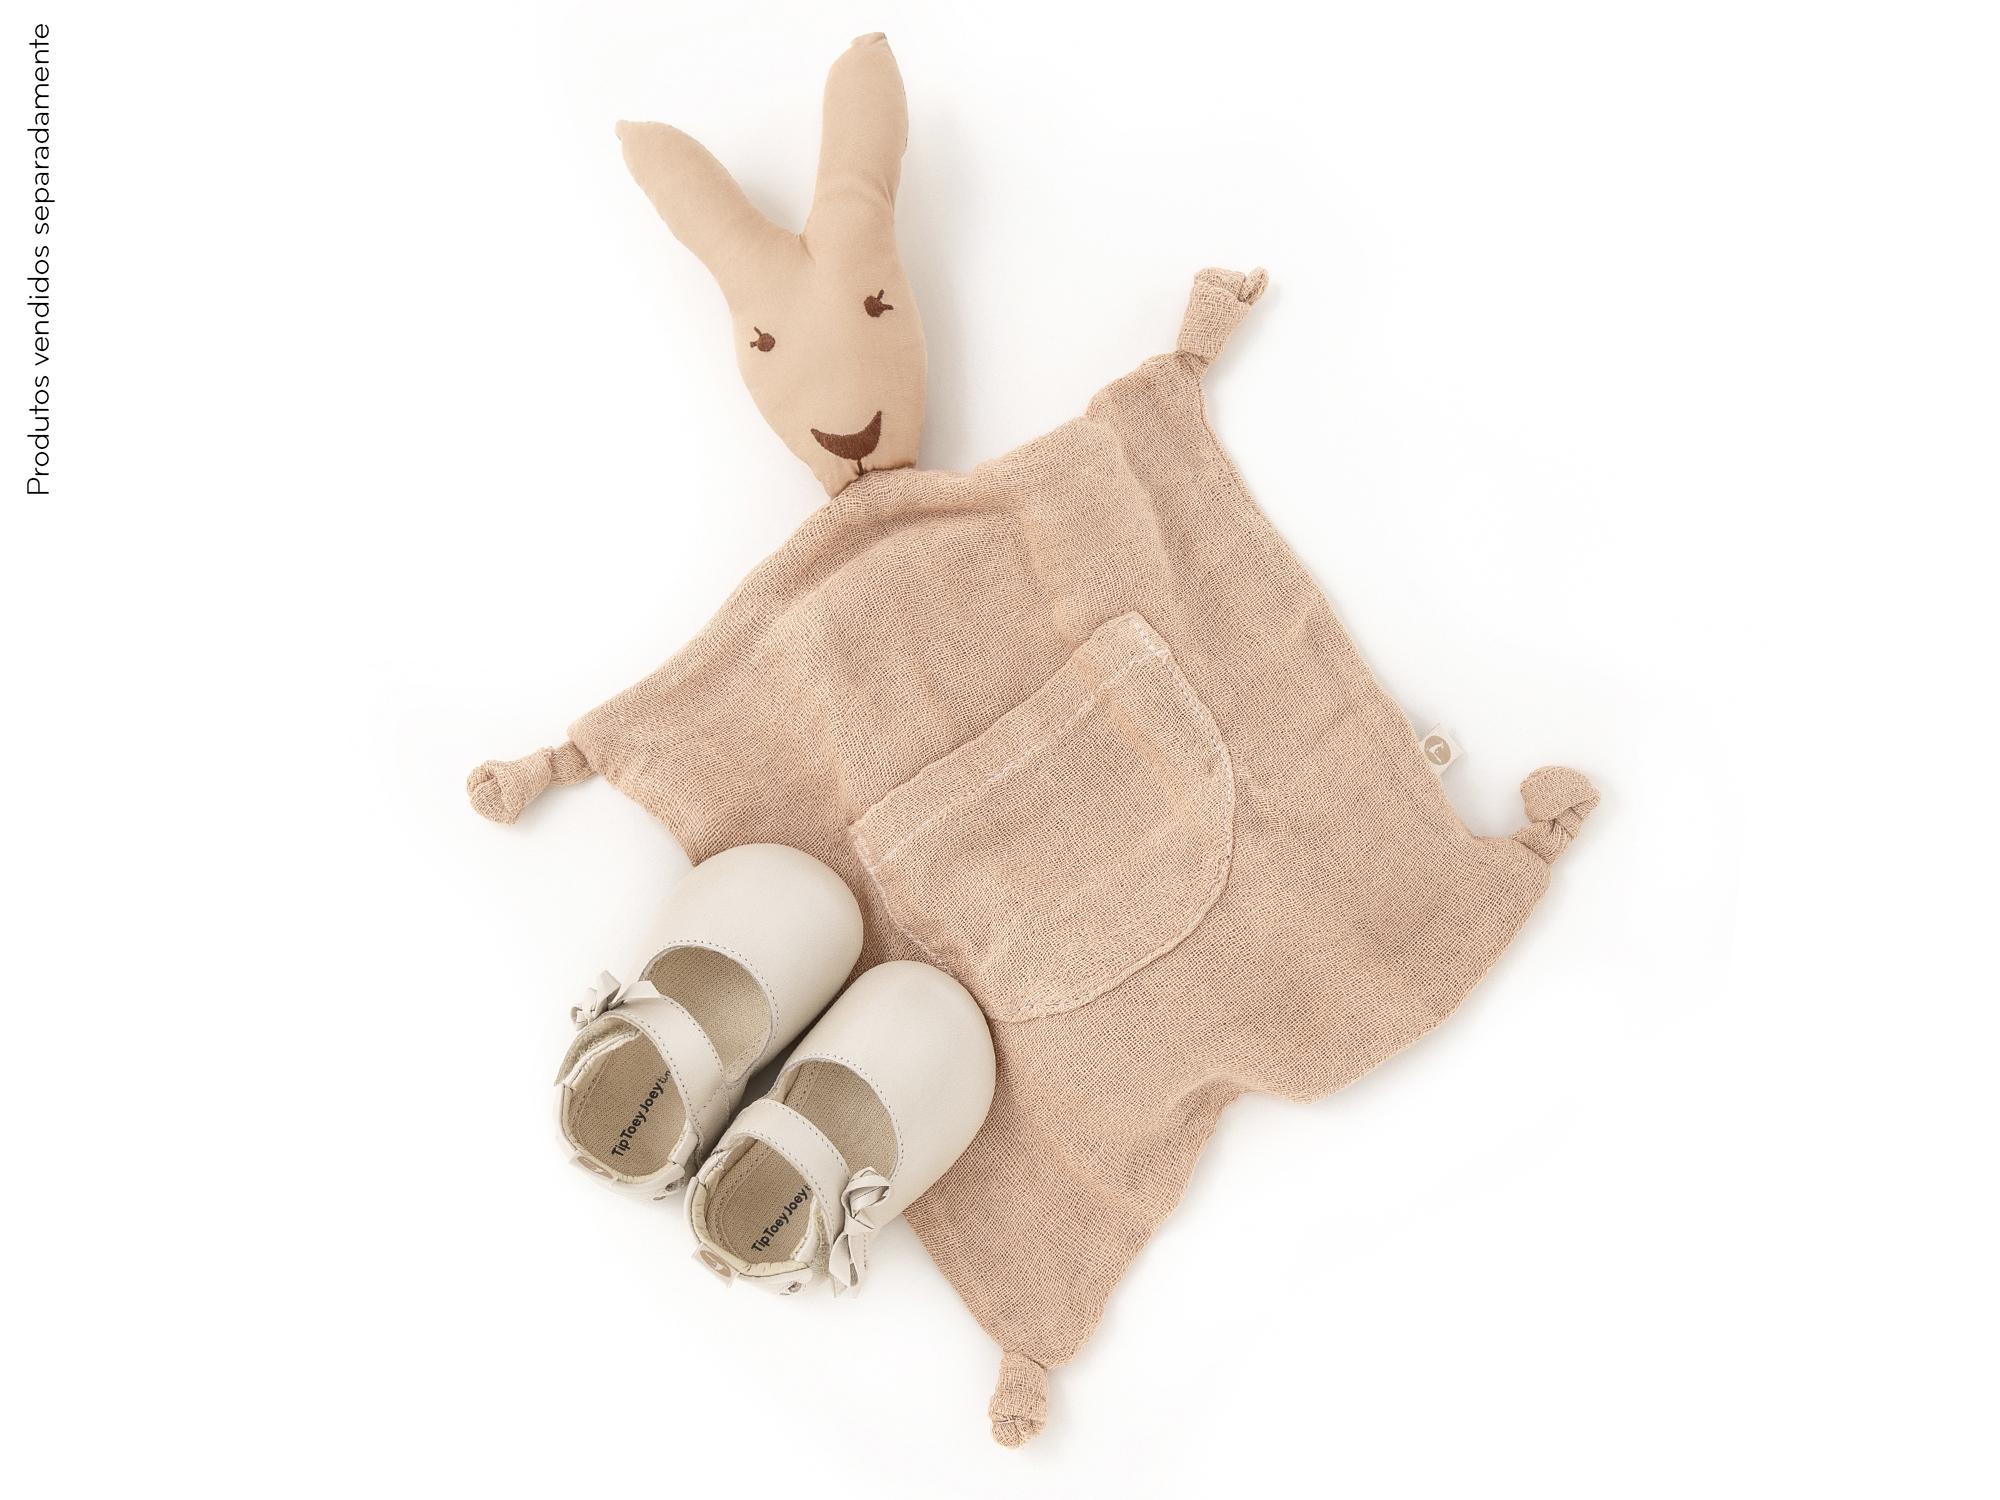 naninha4 infantil unisex1 canguru